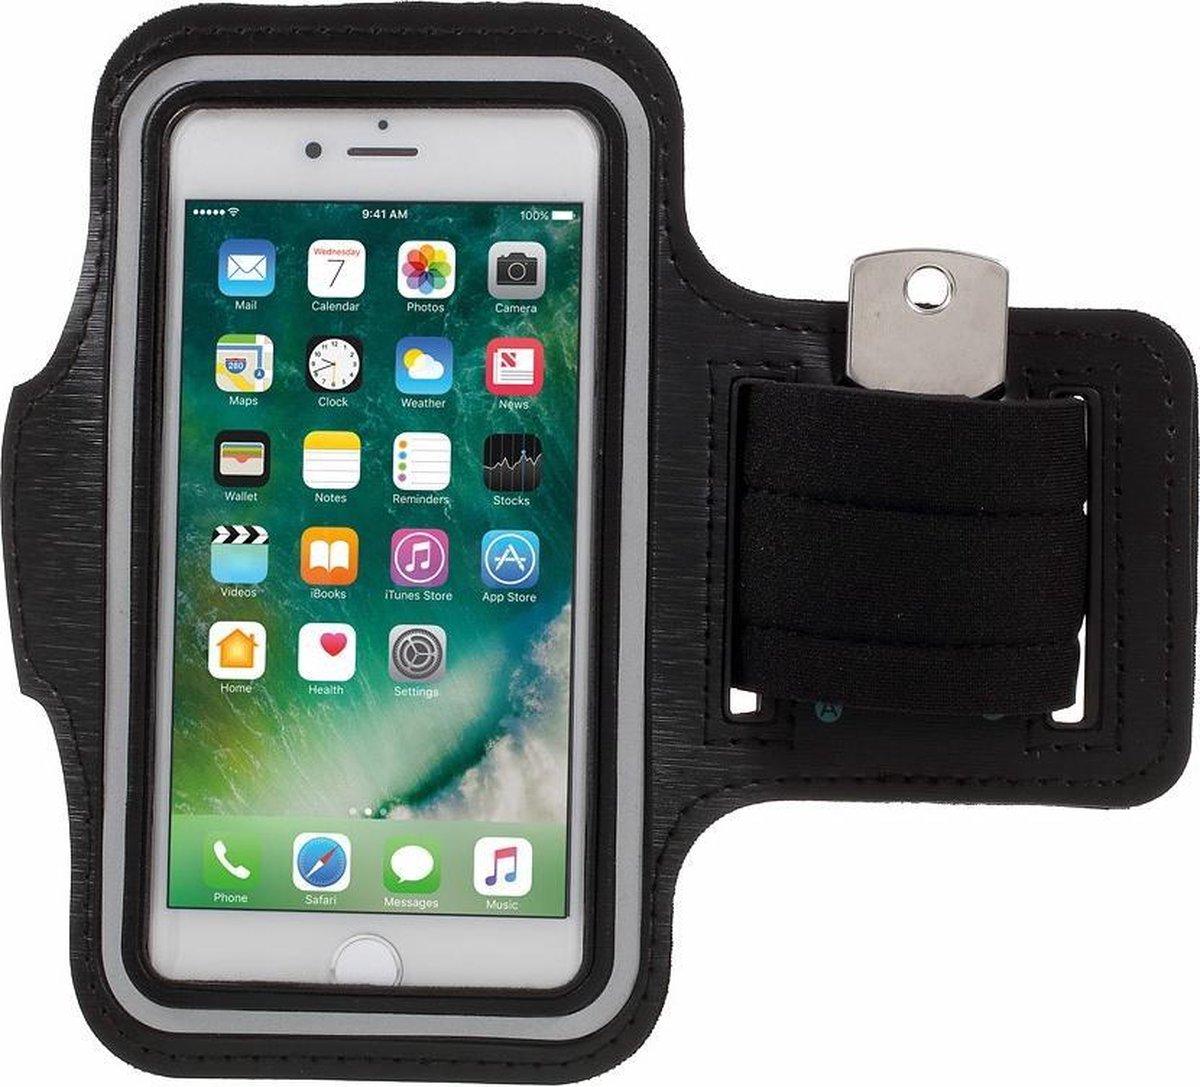 iPhone 6 / 6s / 7 Sport Armband Hardloop Hoesje - Zwart - SoFetch